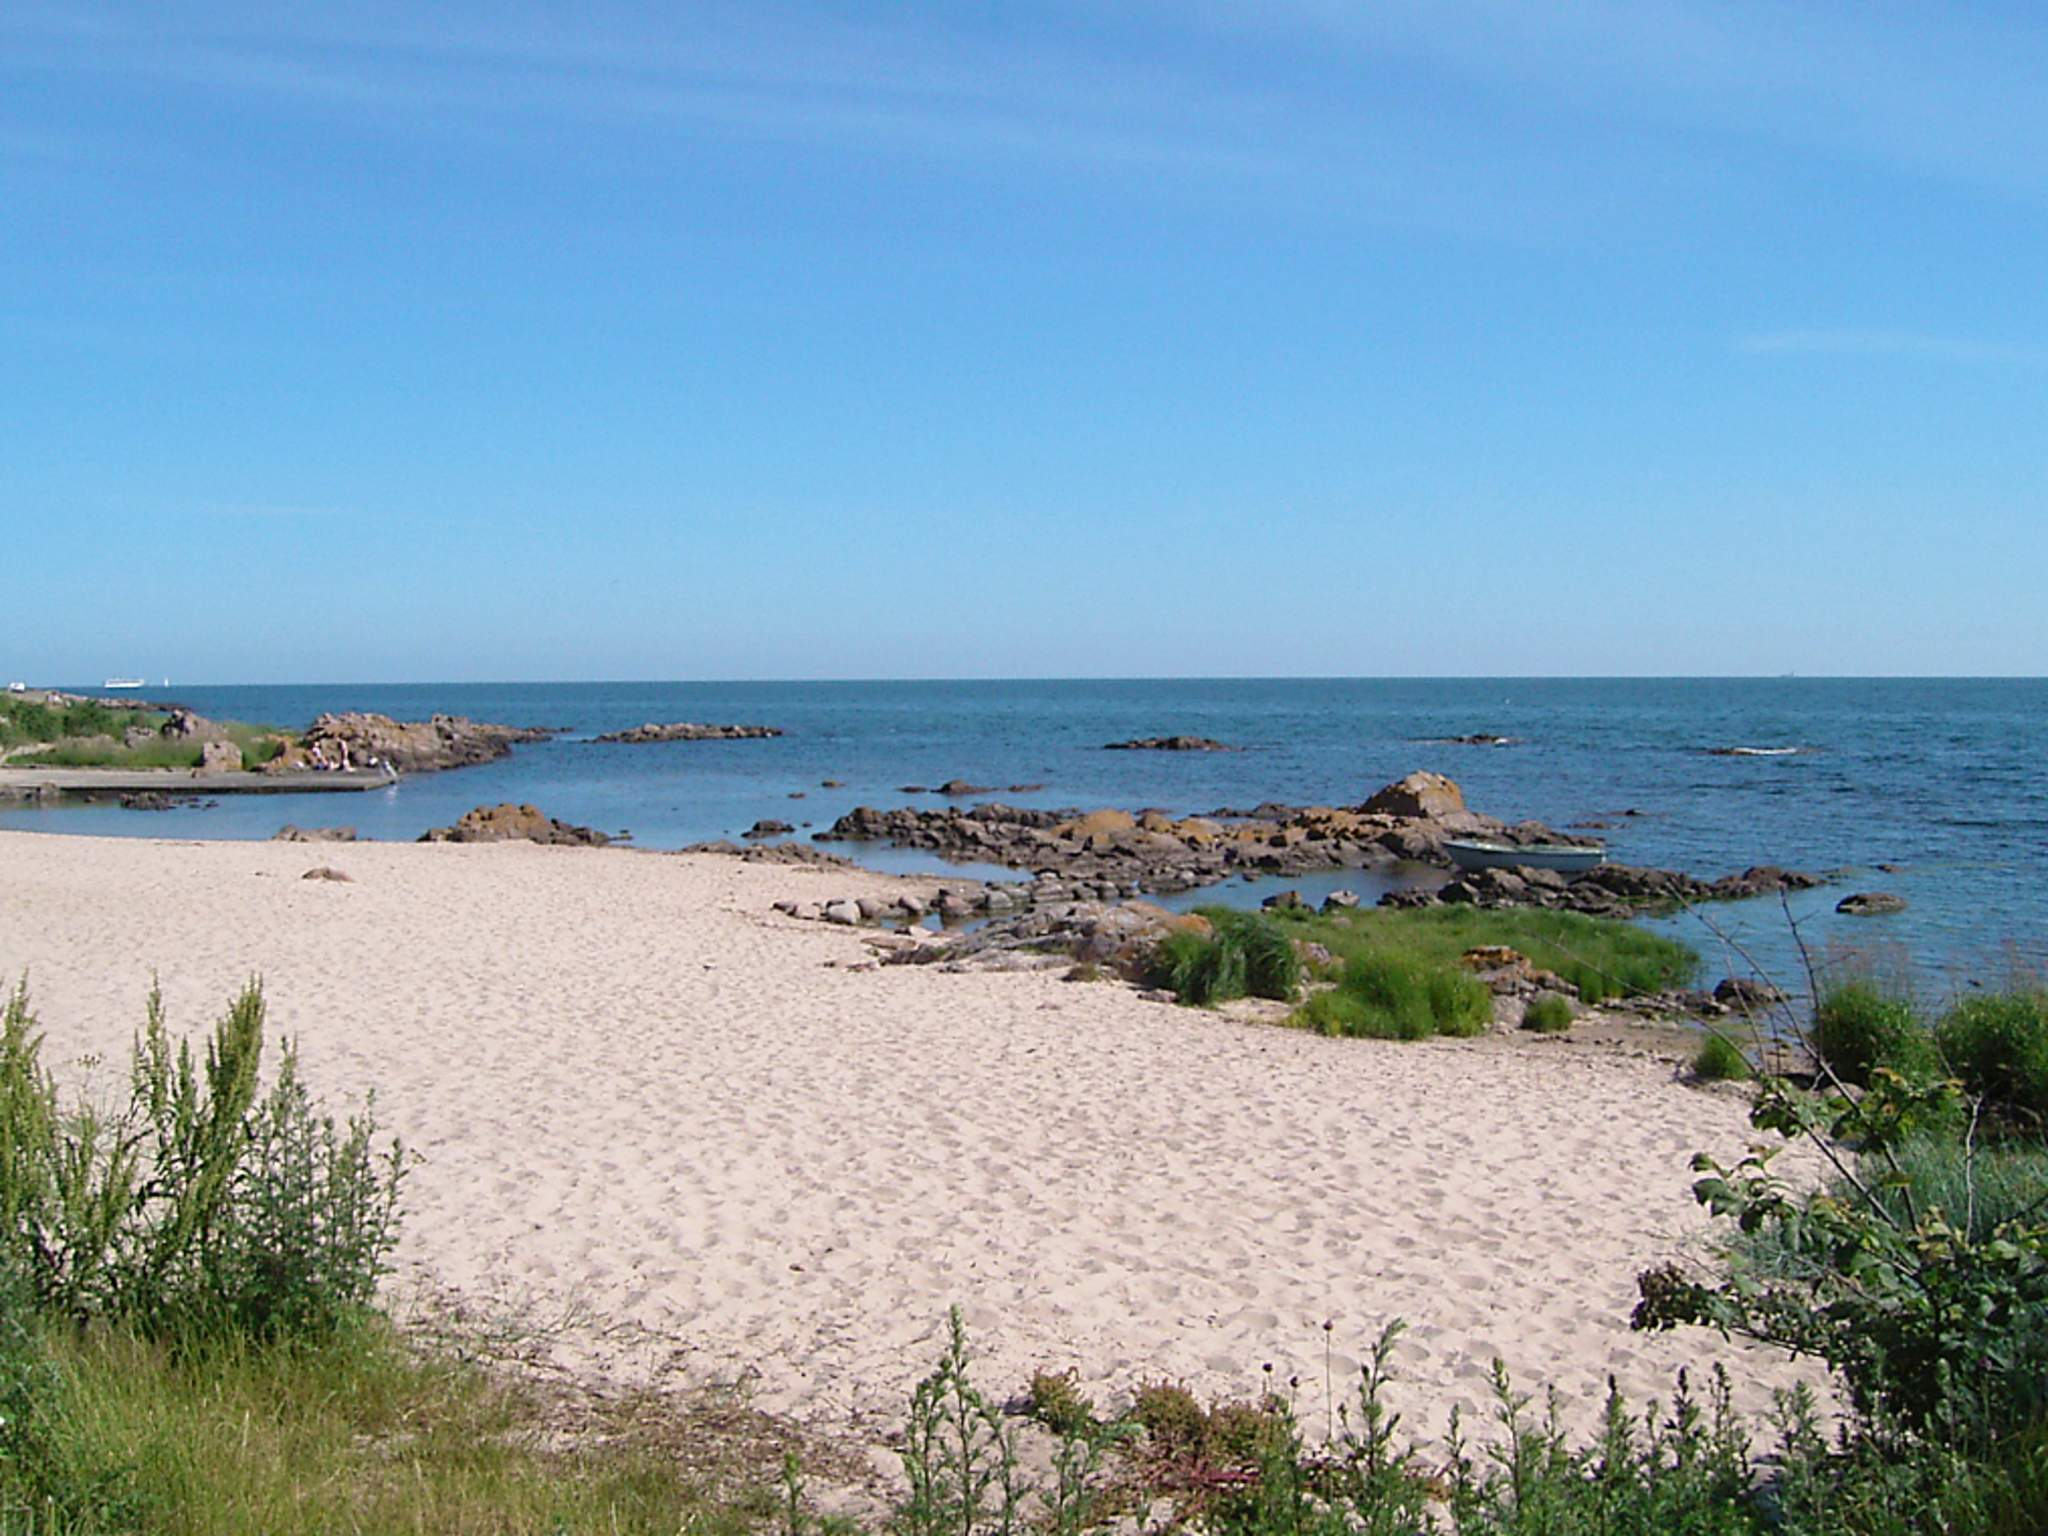 Ferienwohnung Sandkås (257108), Sandkås, , Bornholm, Dänemark, Bild 15